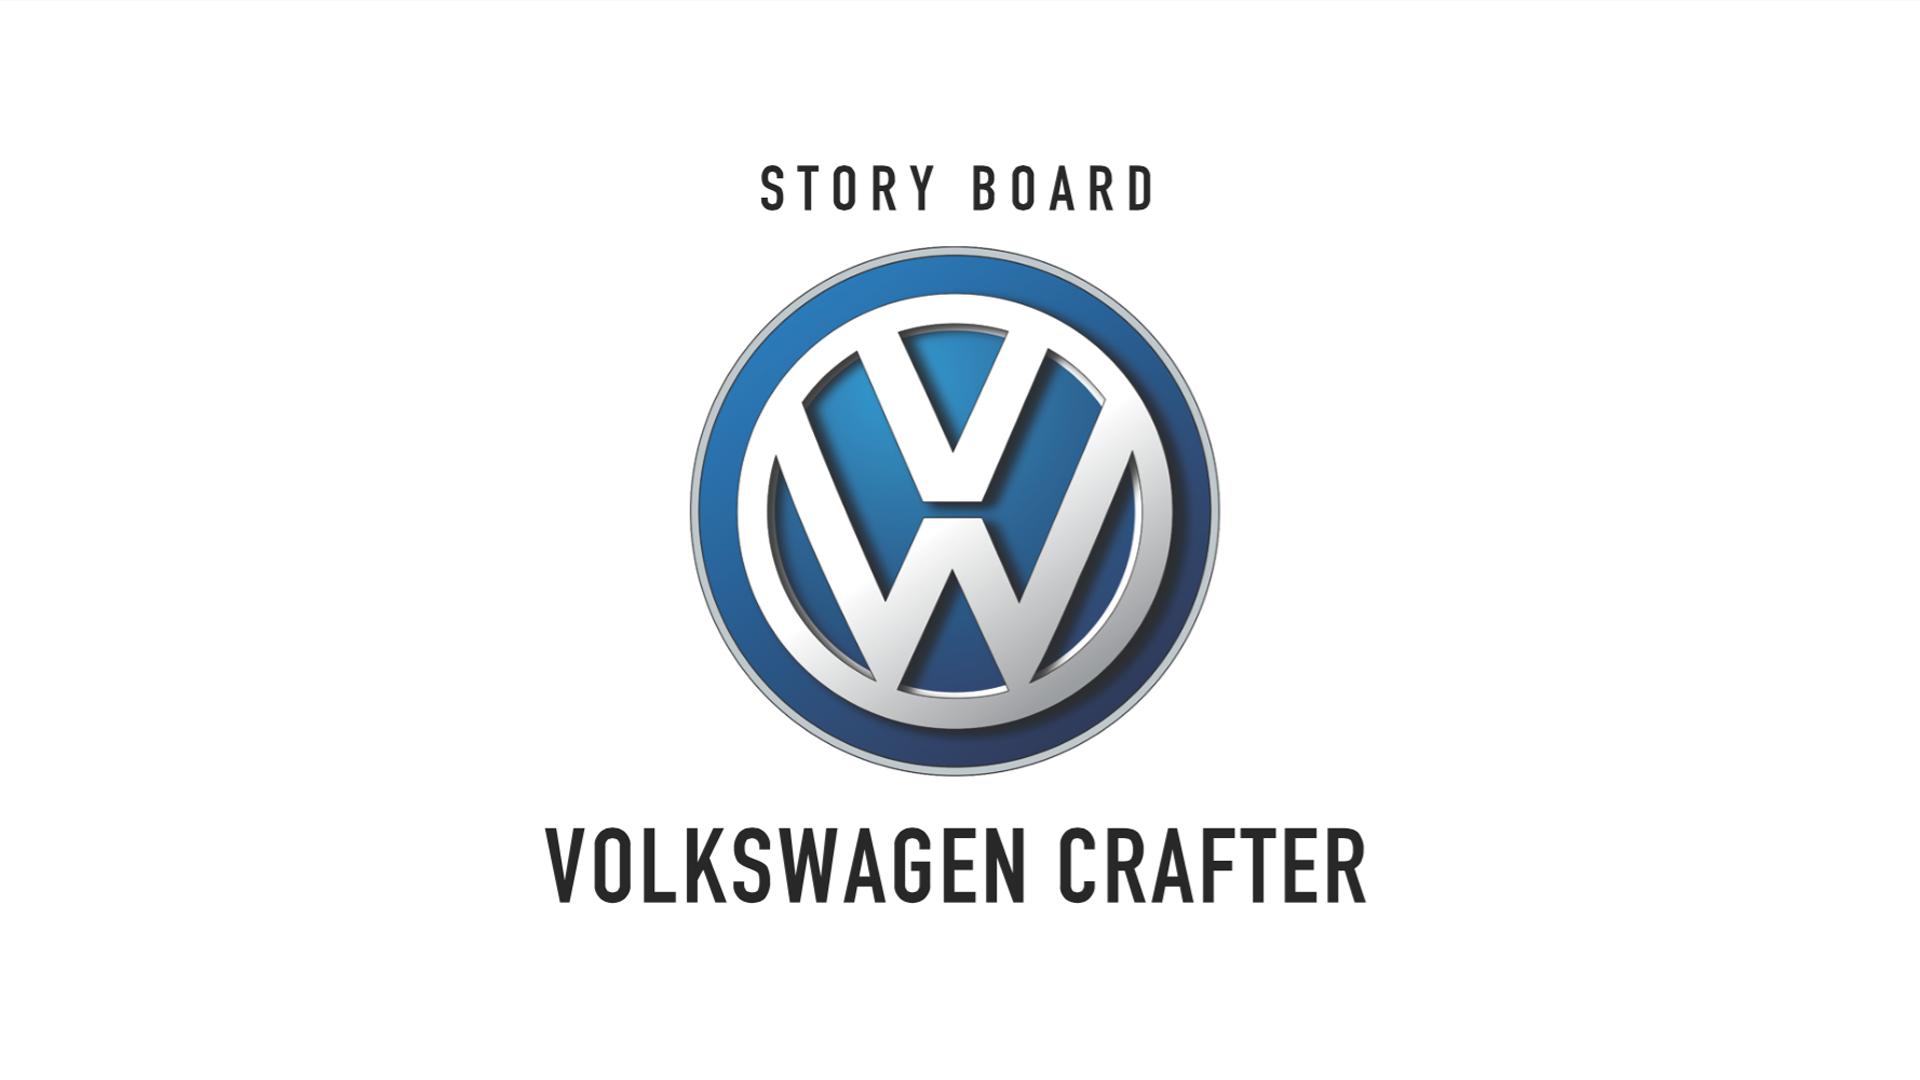 StoryBoard_VOLKSWAGEN CRAFTER_by nooga_Nicolas Agenal_01